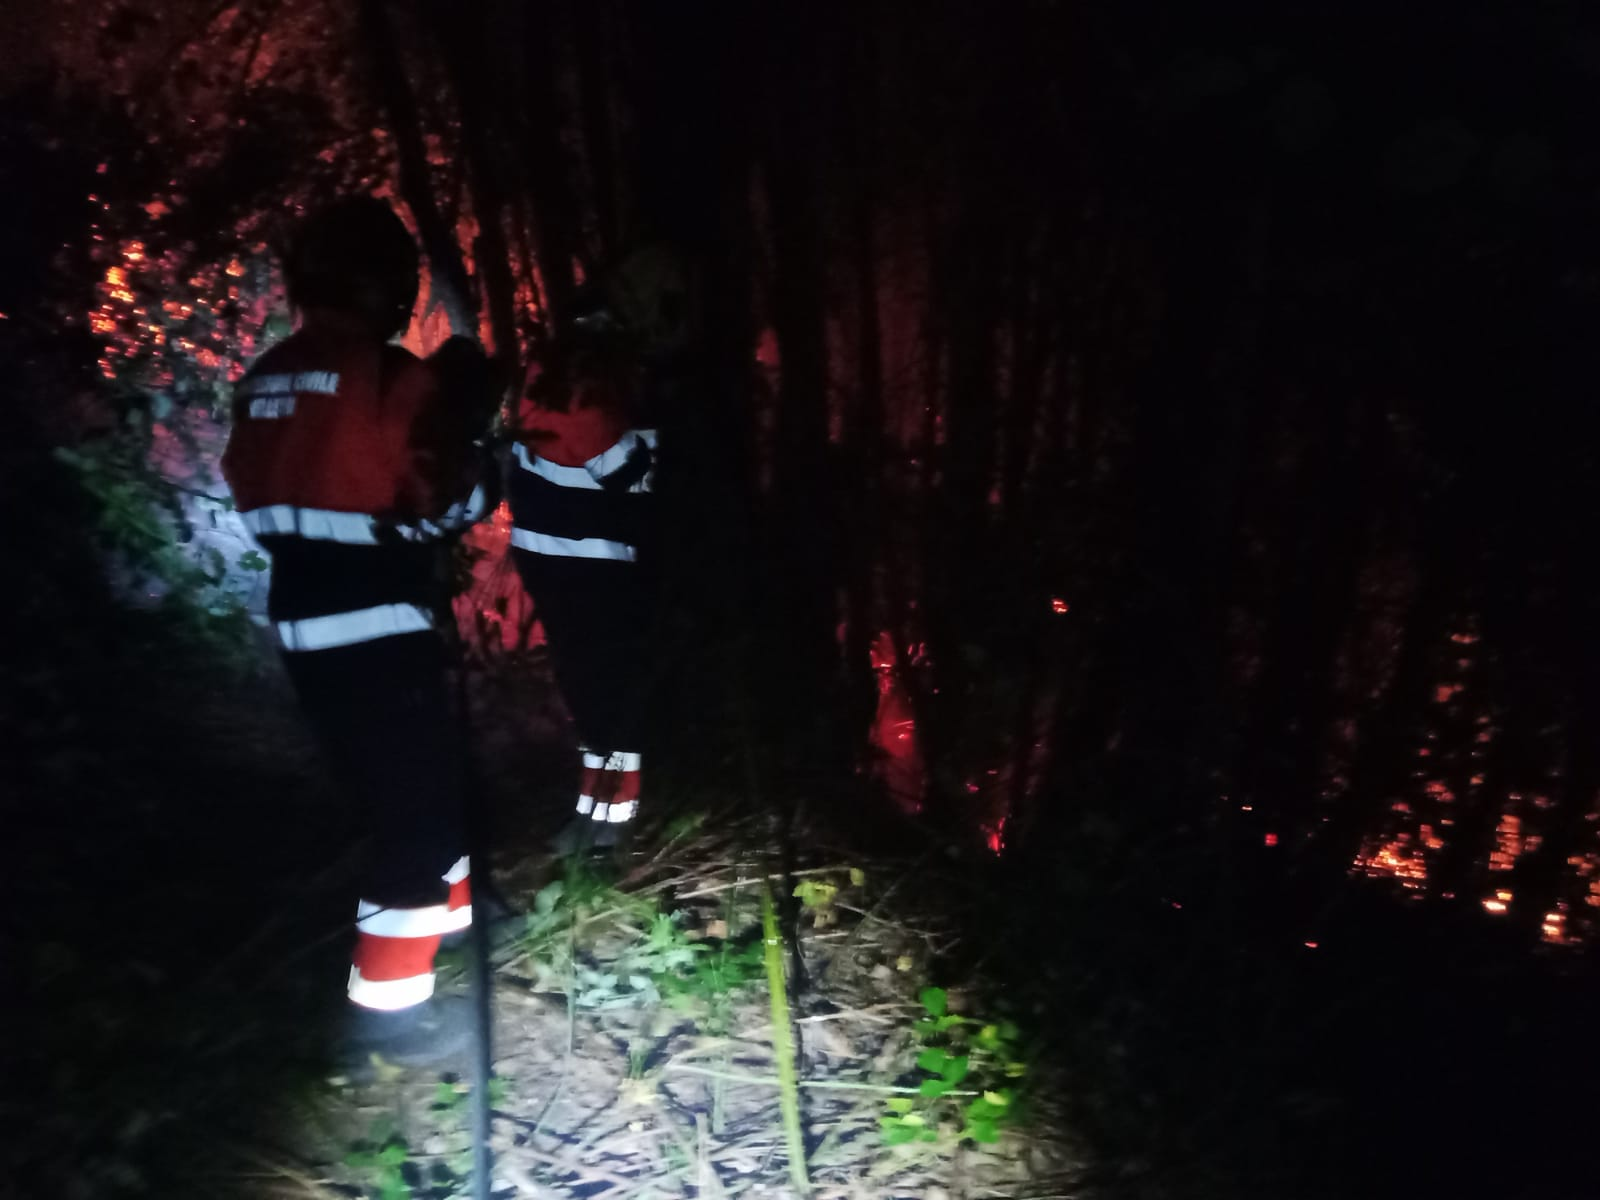 Velletri, si indaga sull'incendio del monte Artemisio